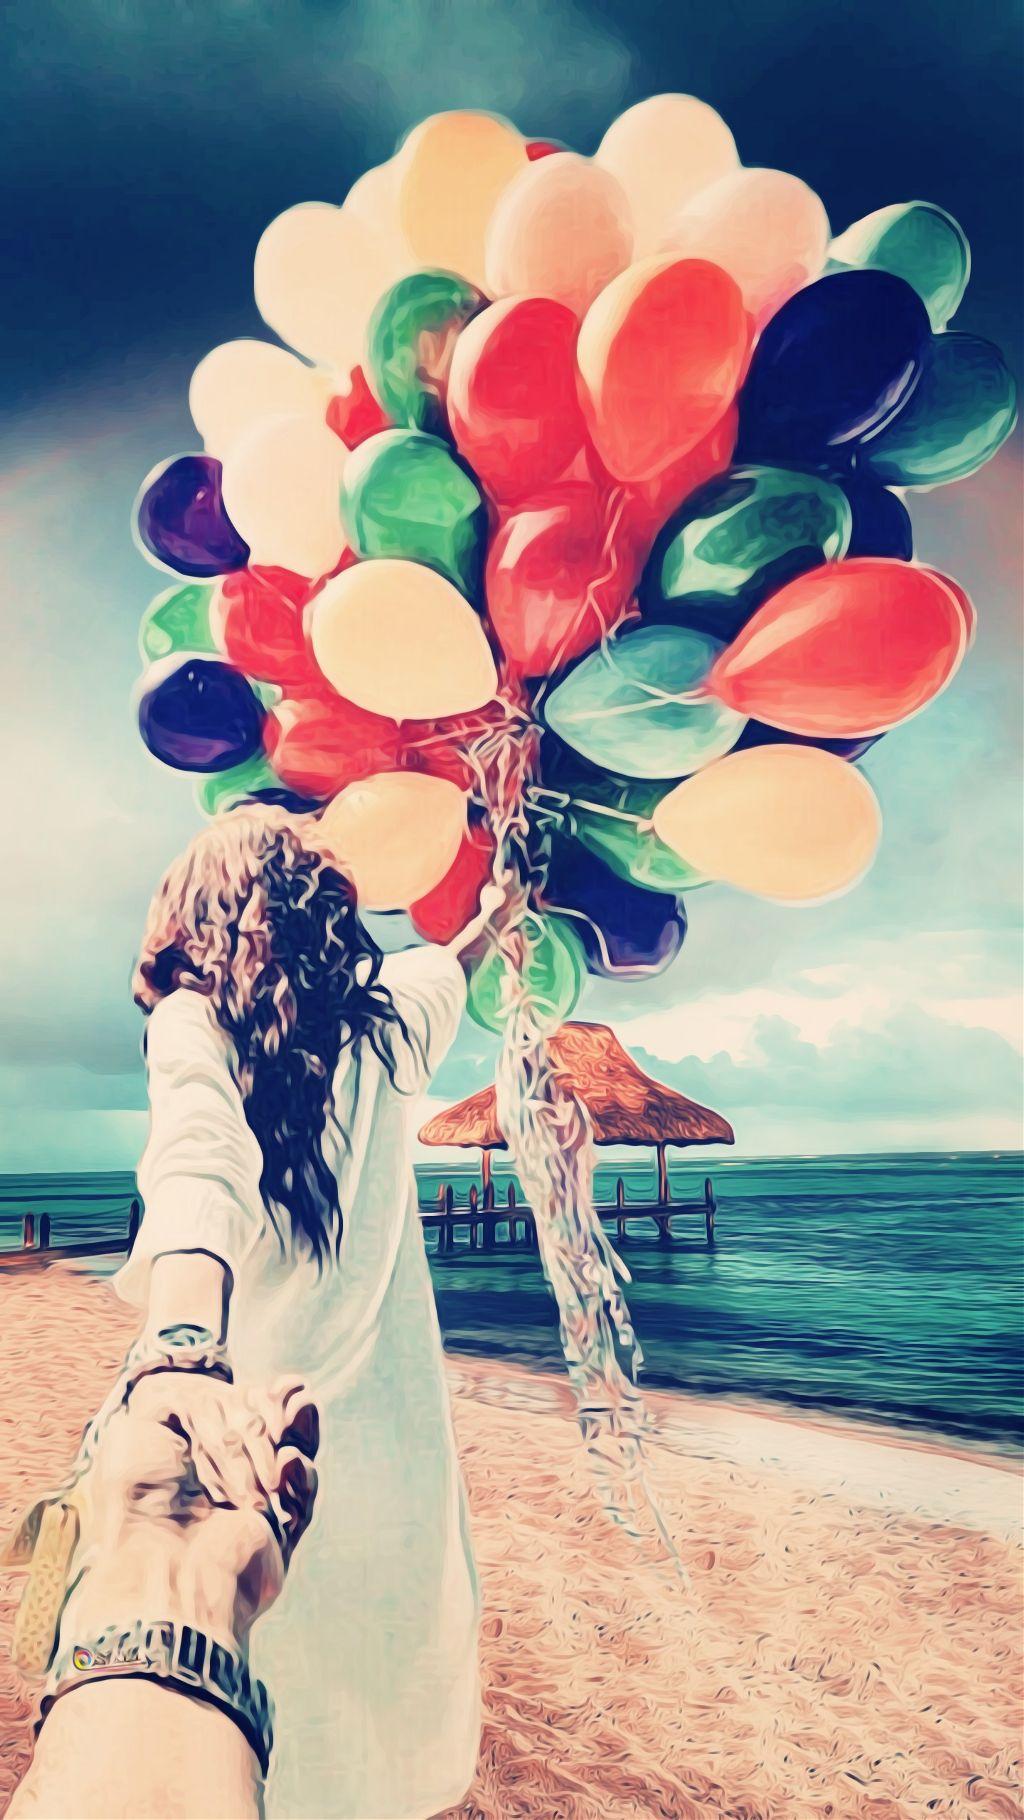 #freetoedit #love #balloons #dear #people #sea #sky #double #hand #girl